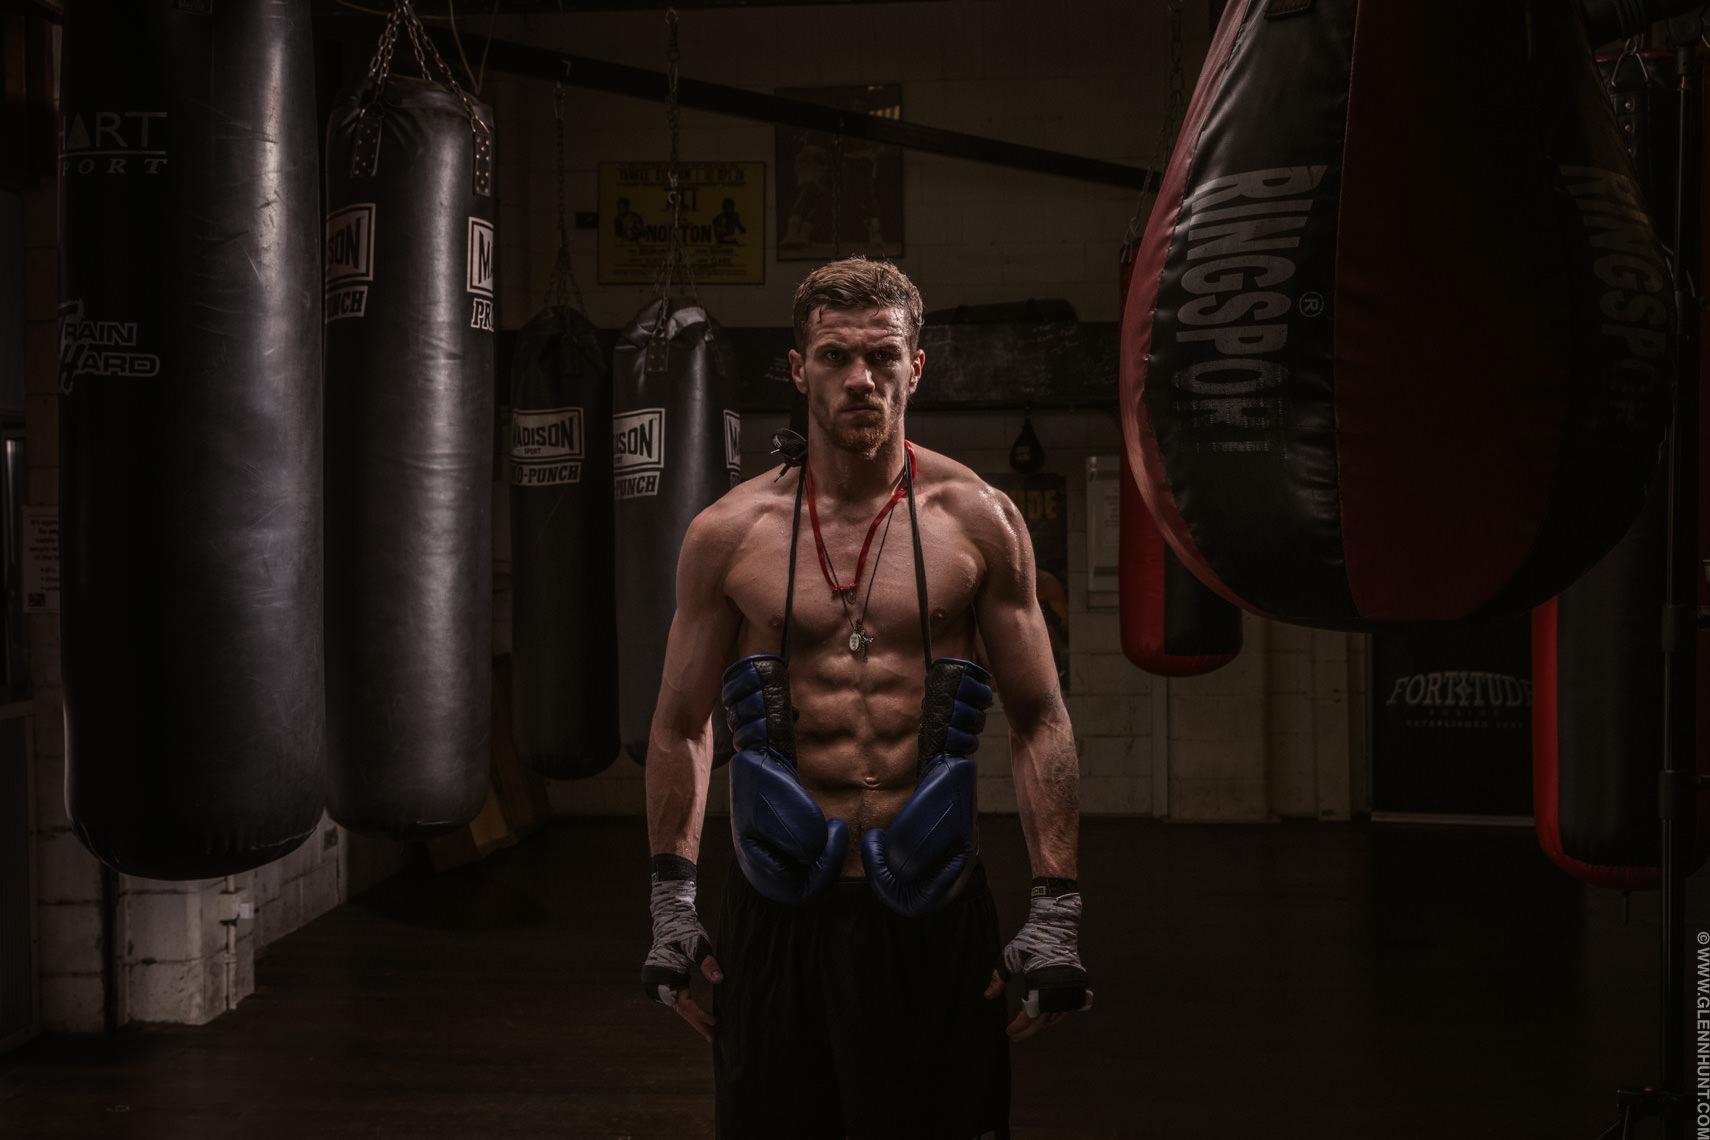 Boxer Gary Corcoran